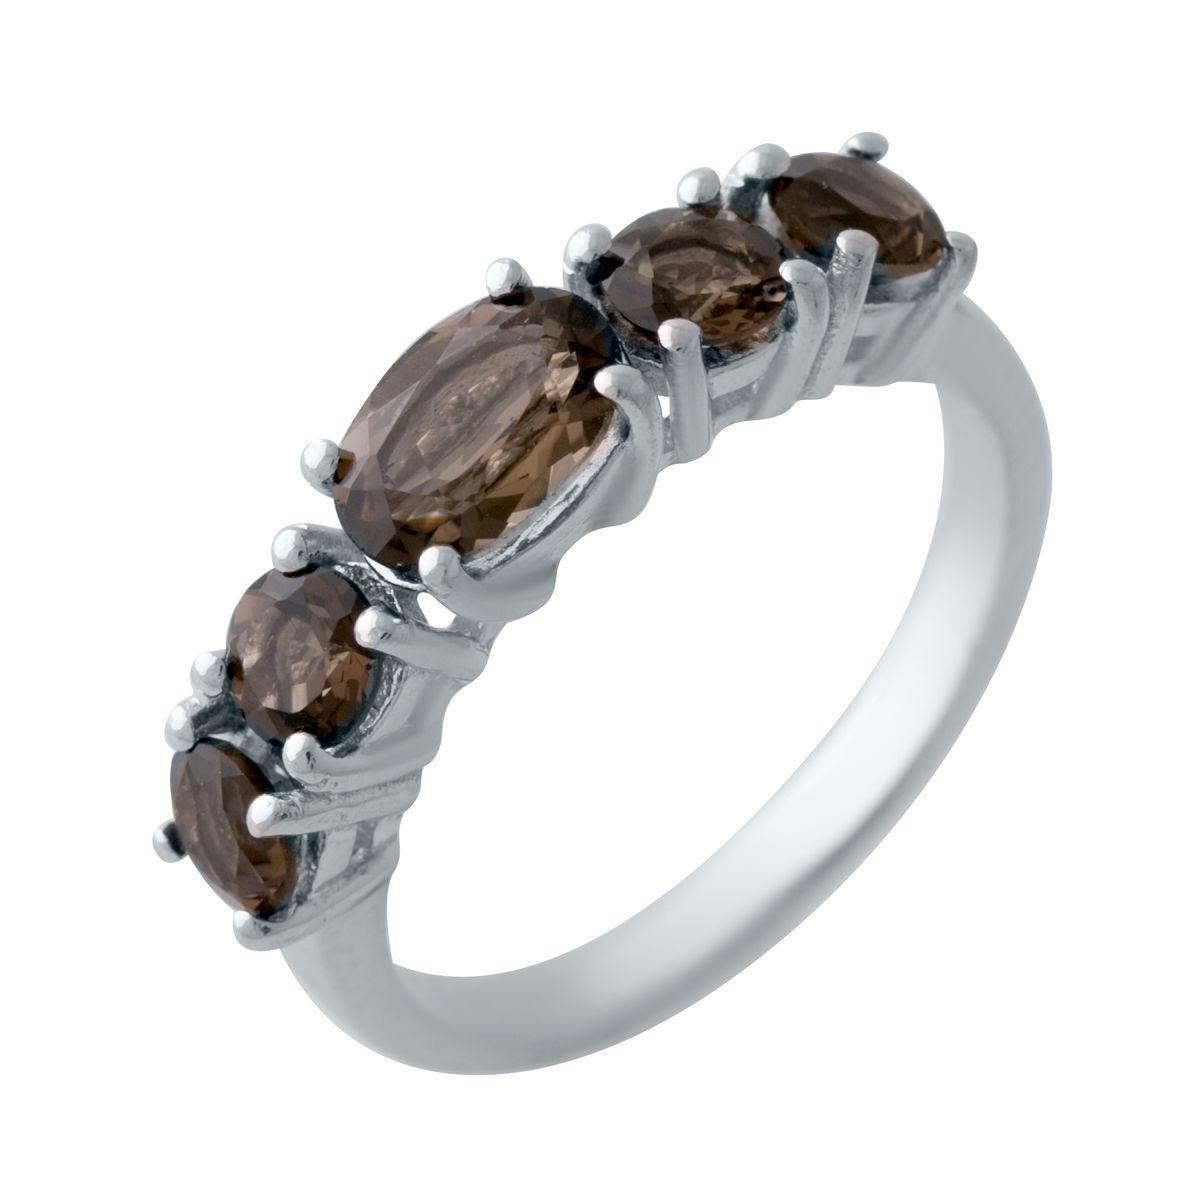 Серебряное кольцо pSilverAlex с натуральным раухтопазом (димчатим кварцем) (2025436) 18 размер